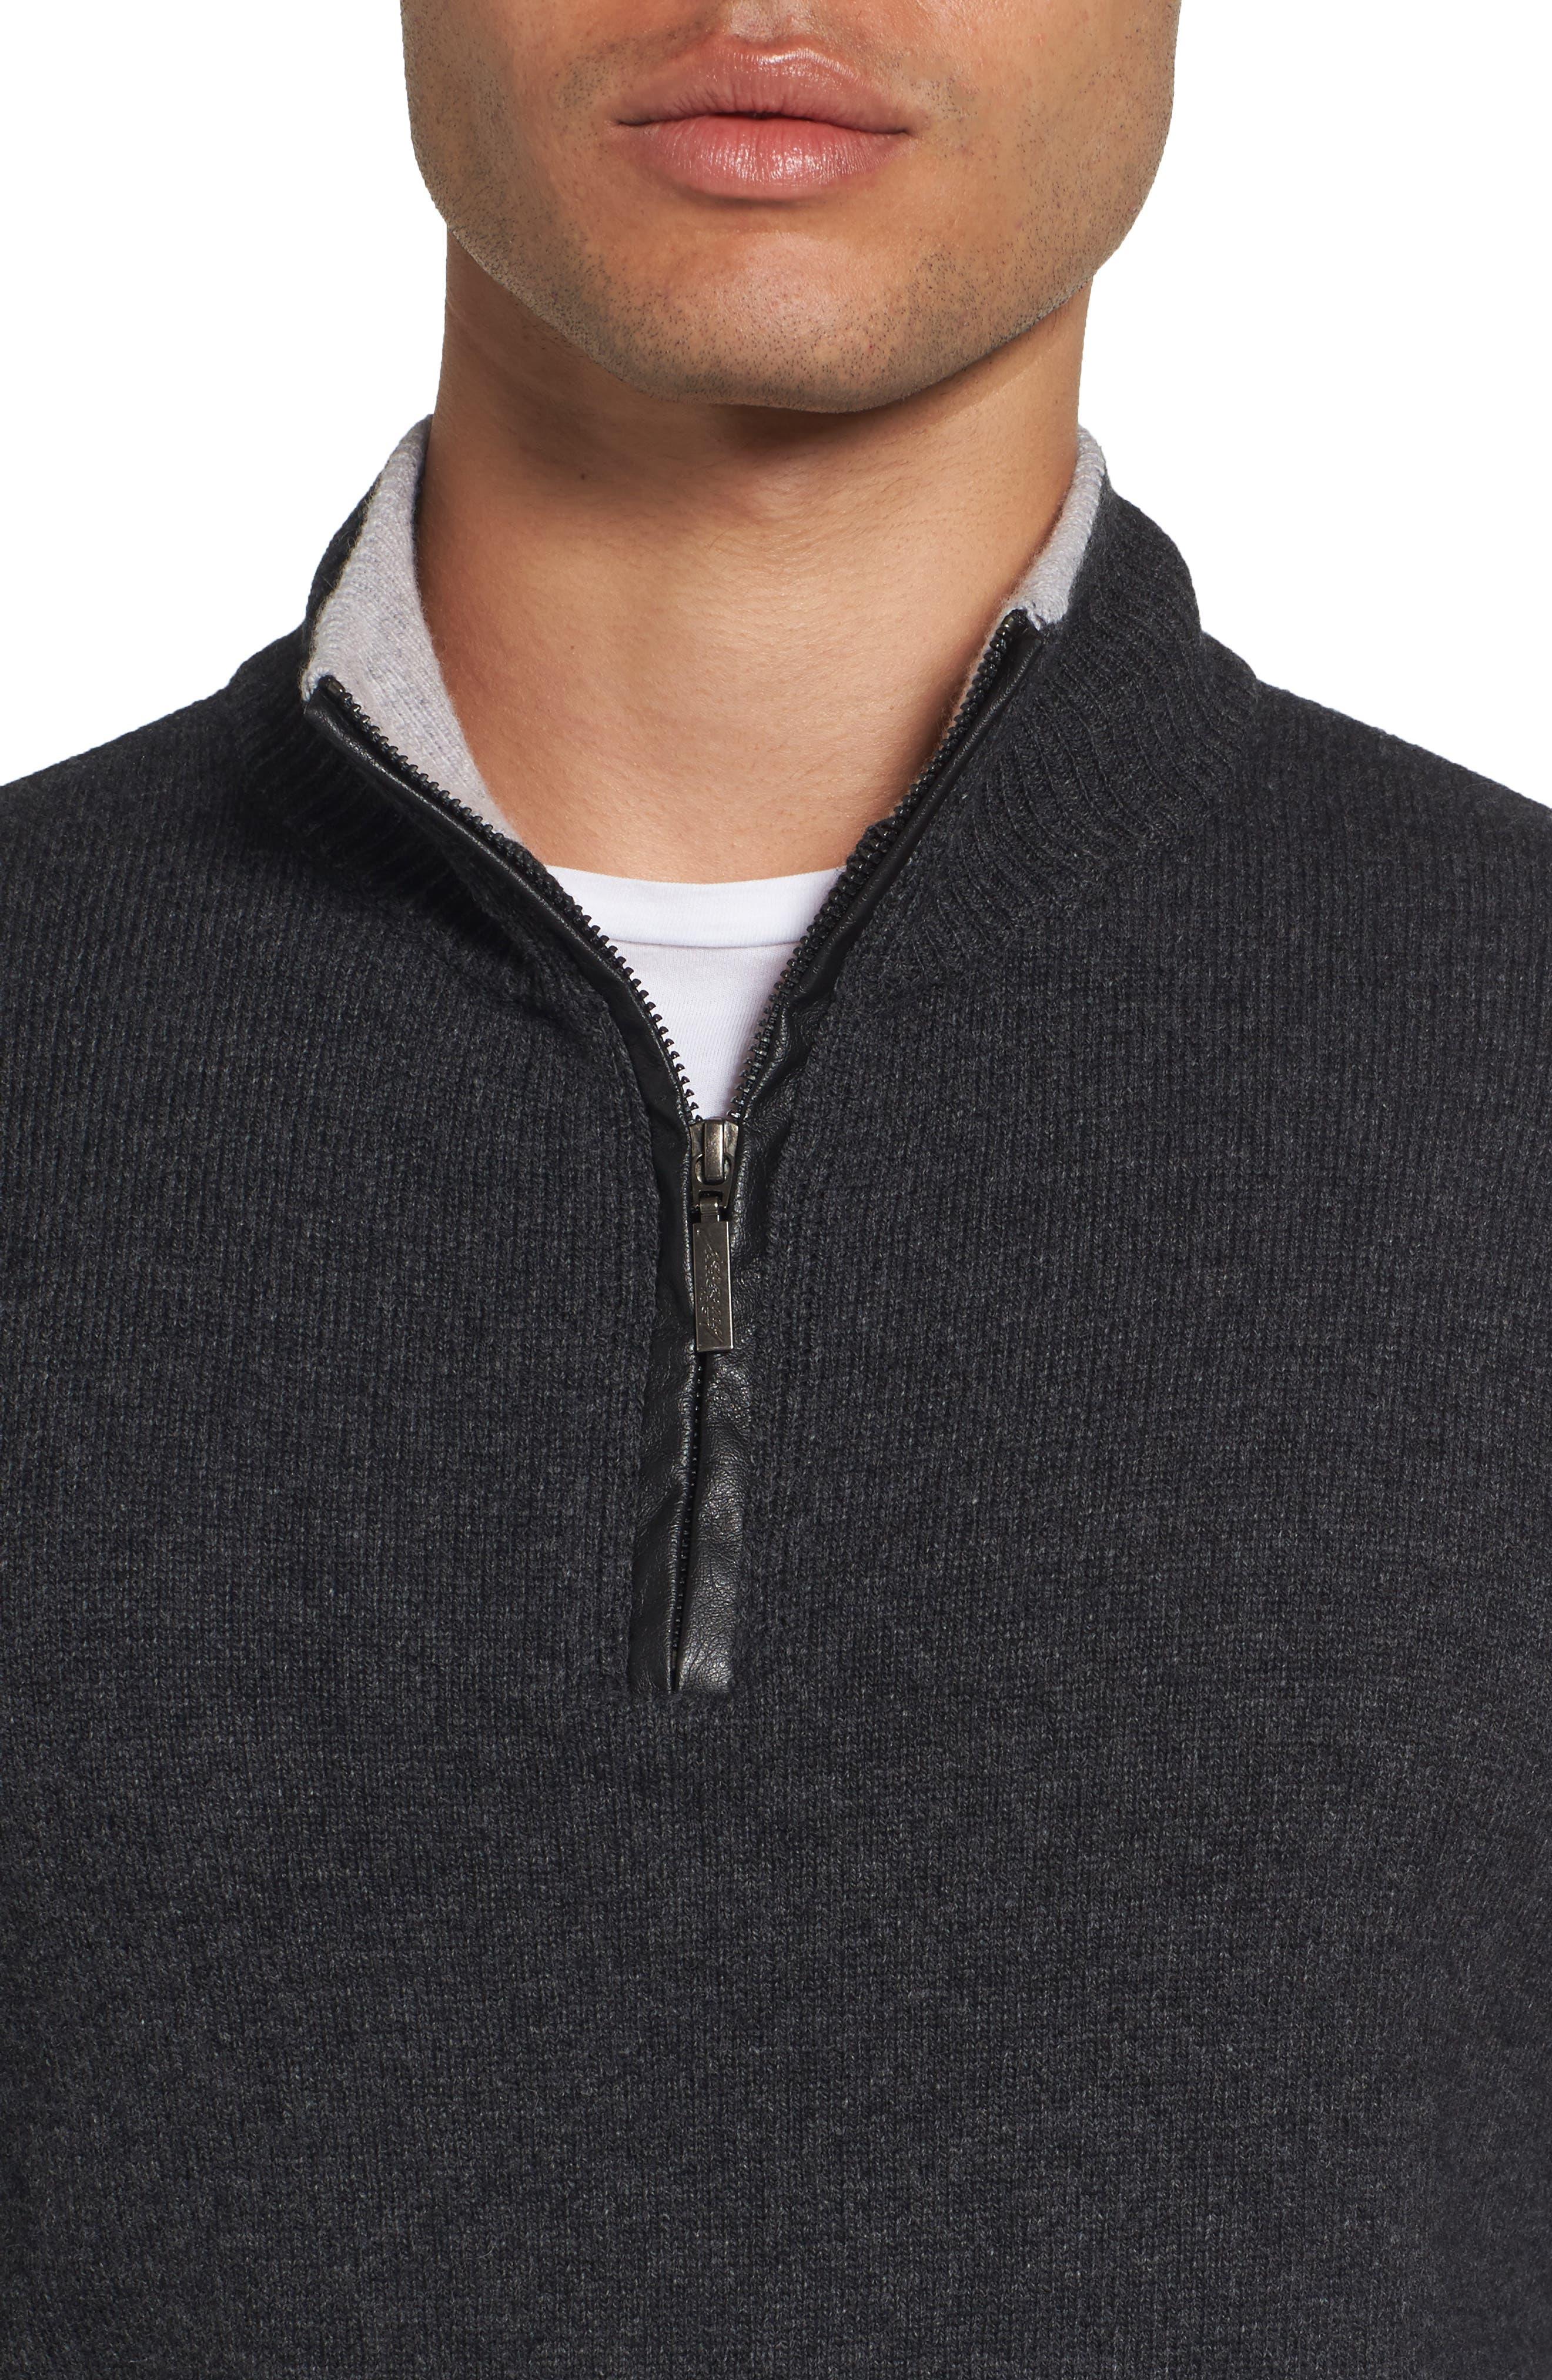 Wool Blend Quarter Zip Sweater,                             Alternate thumbnail 4, color,                             025